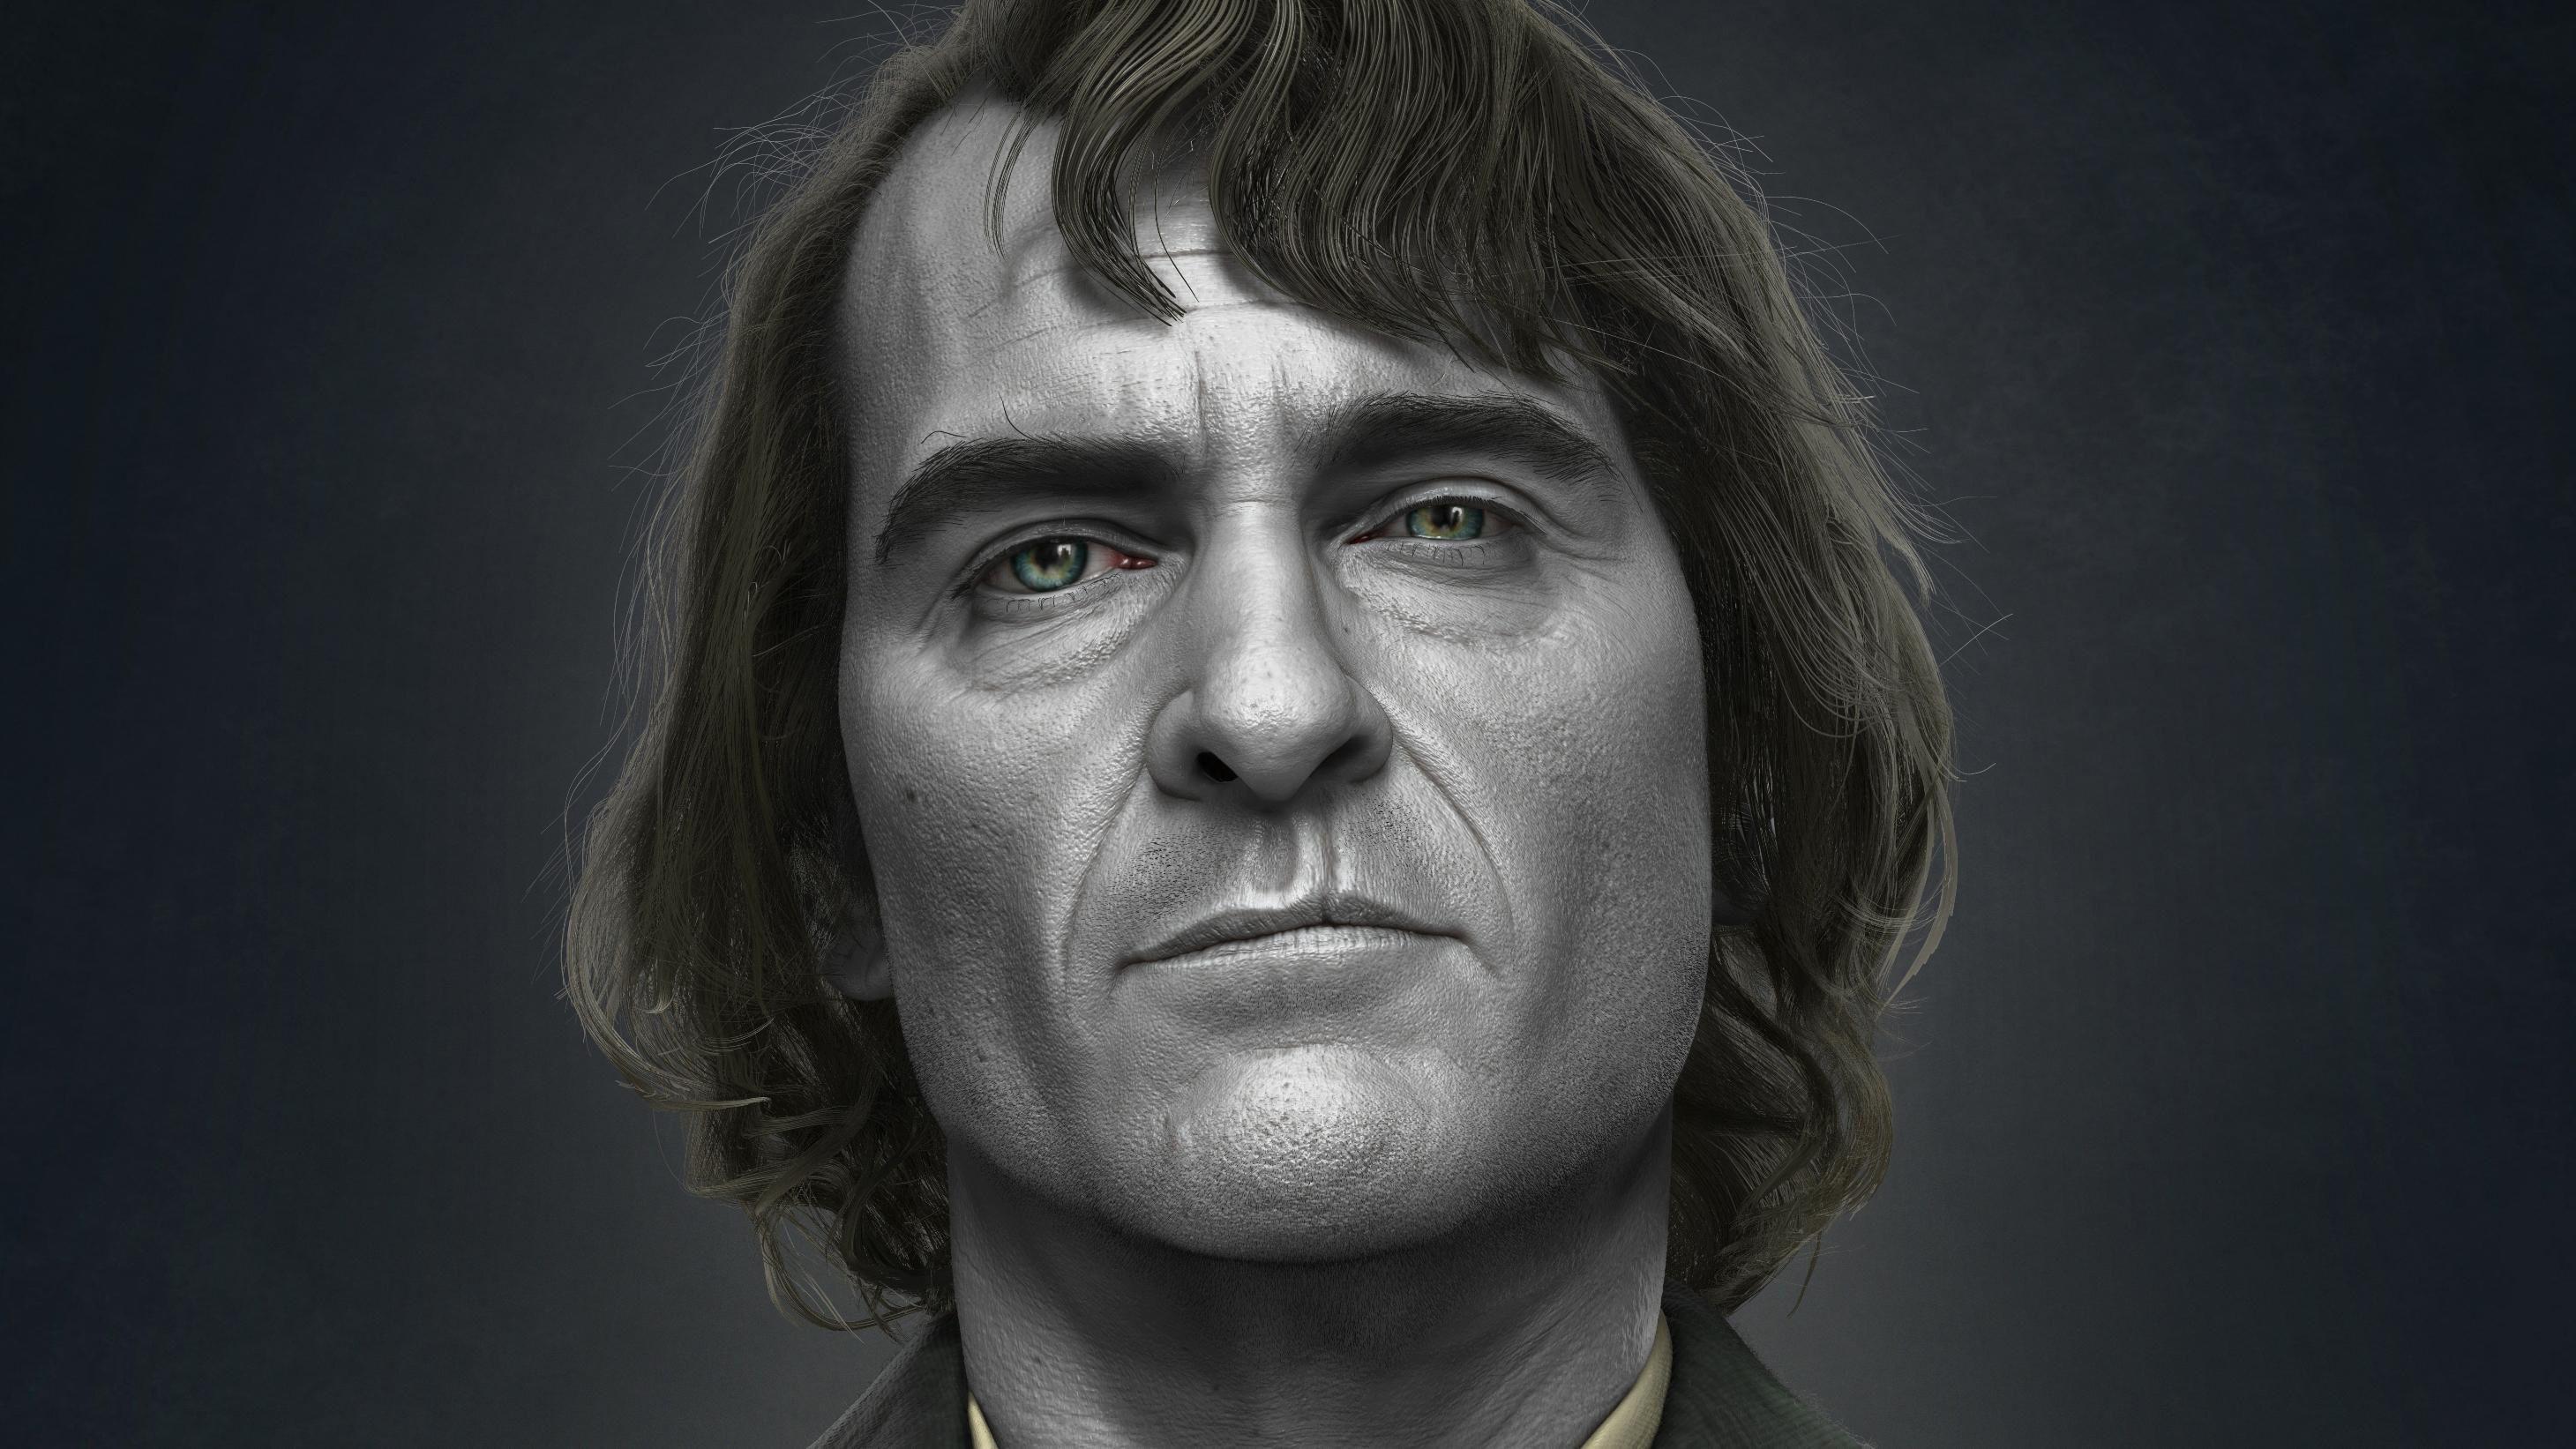 Joaquin Phoenix Wallpapers Top Free Joaquin Phoenix